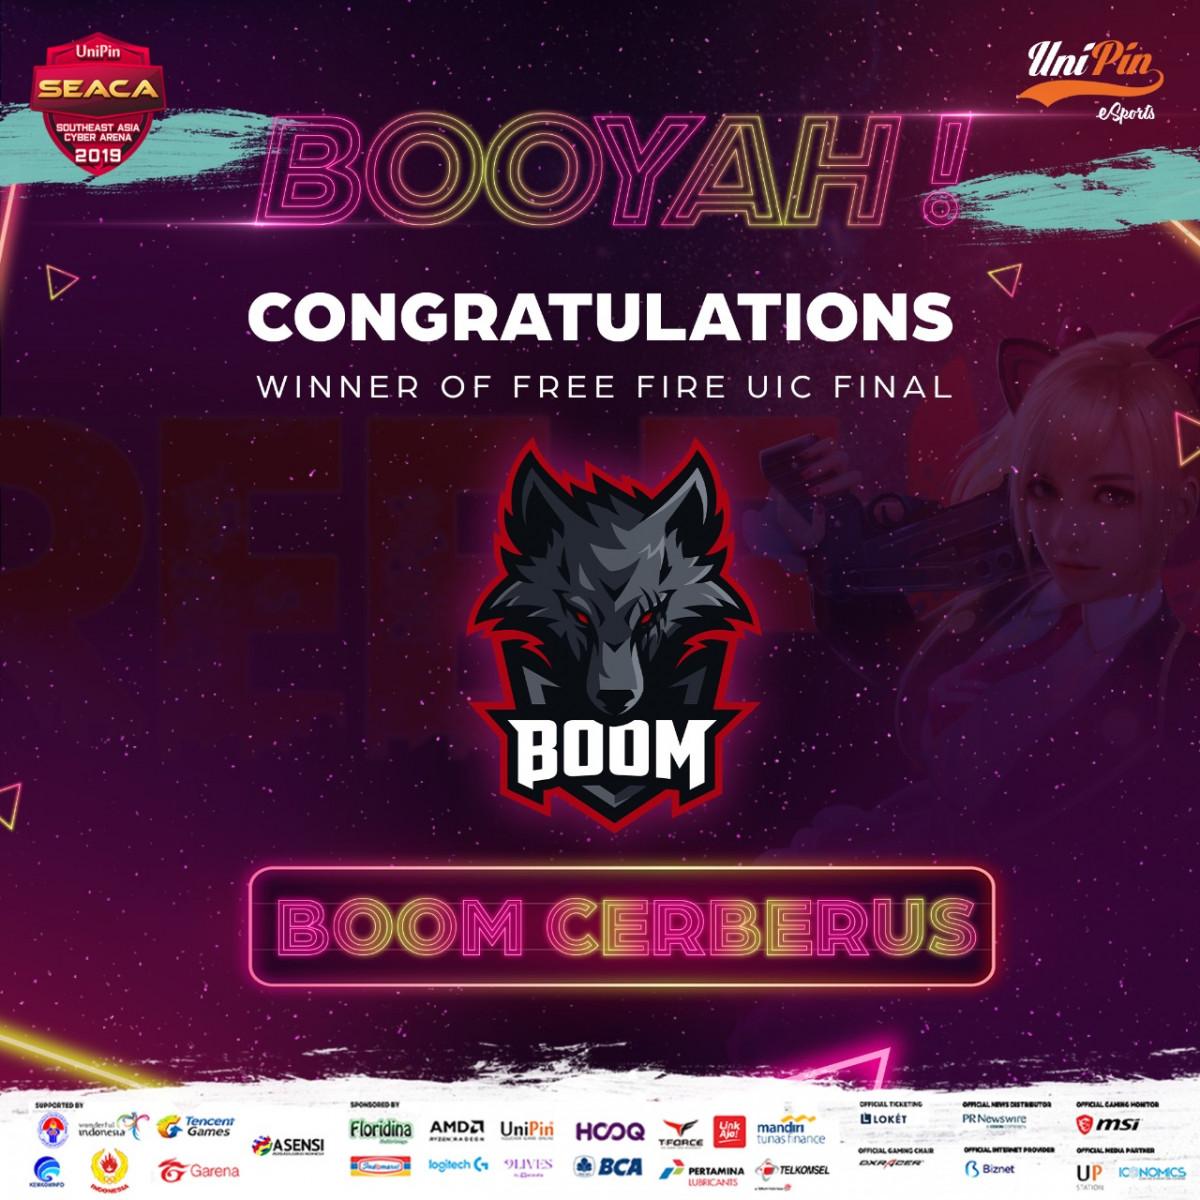 Booyah! BOOM Cerberus Menjadi Juara UIC Free Fire di SEACA 2019!